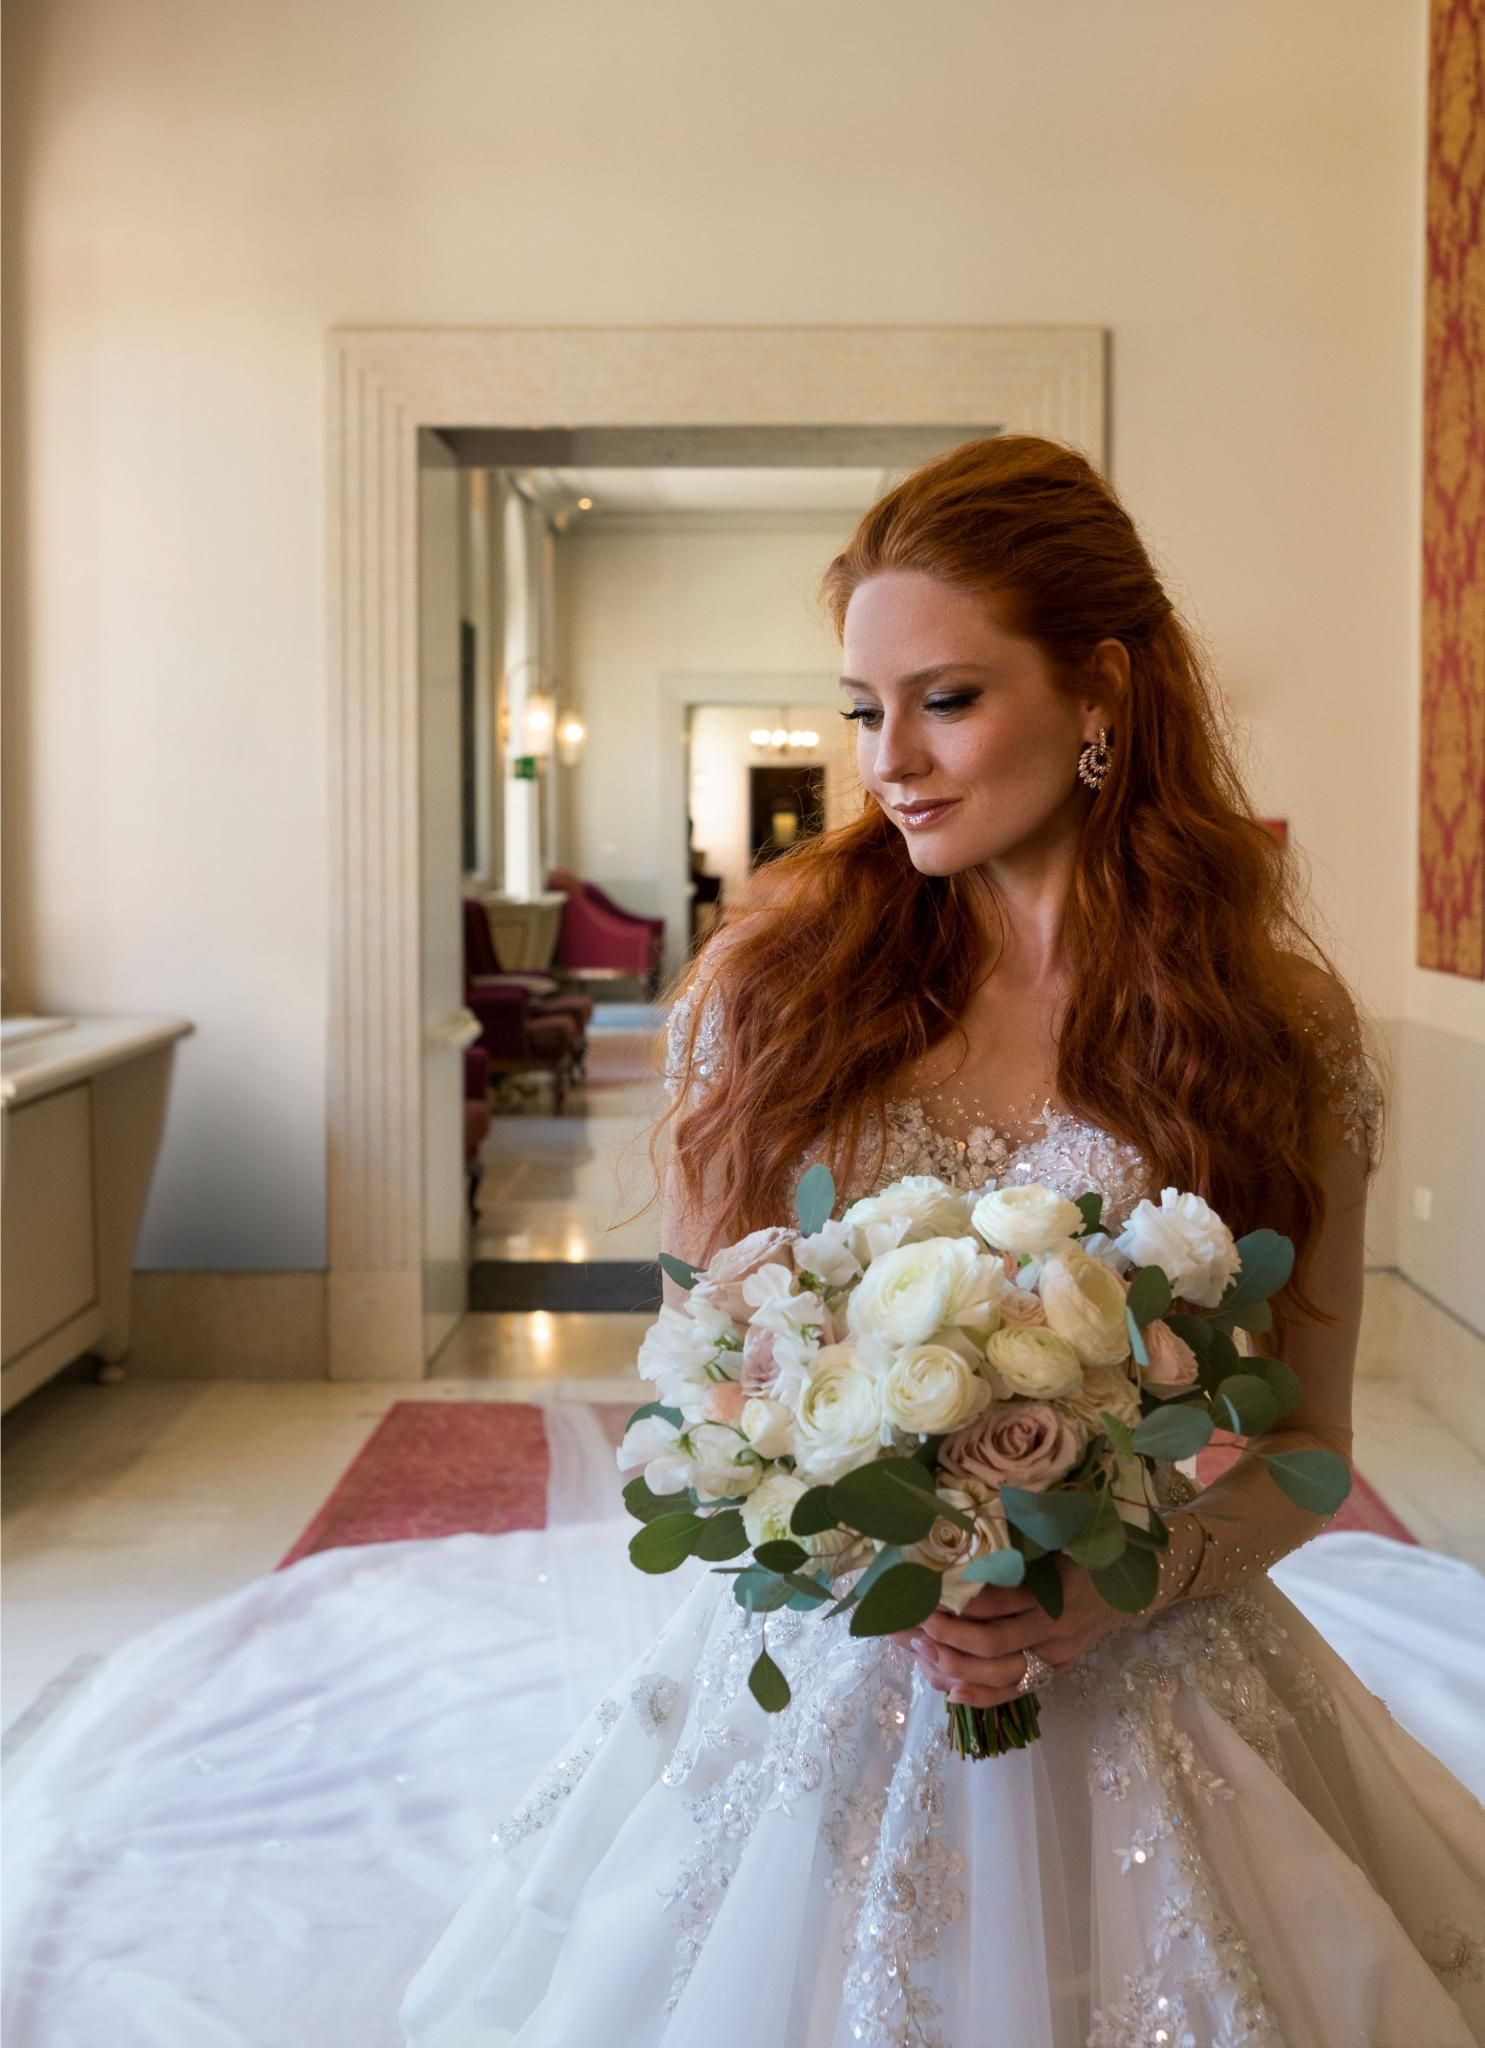 Bride Of The Week Barbara Meier Celebrity Bride Bride Galia Lahav Wedding Gowns